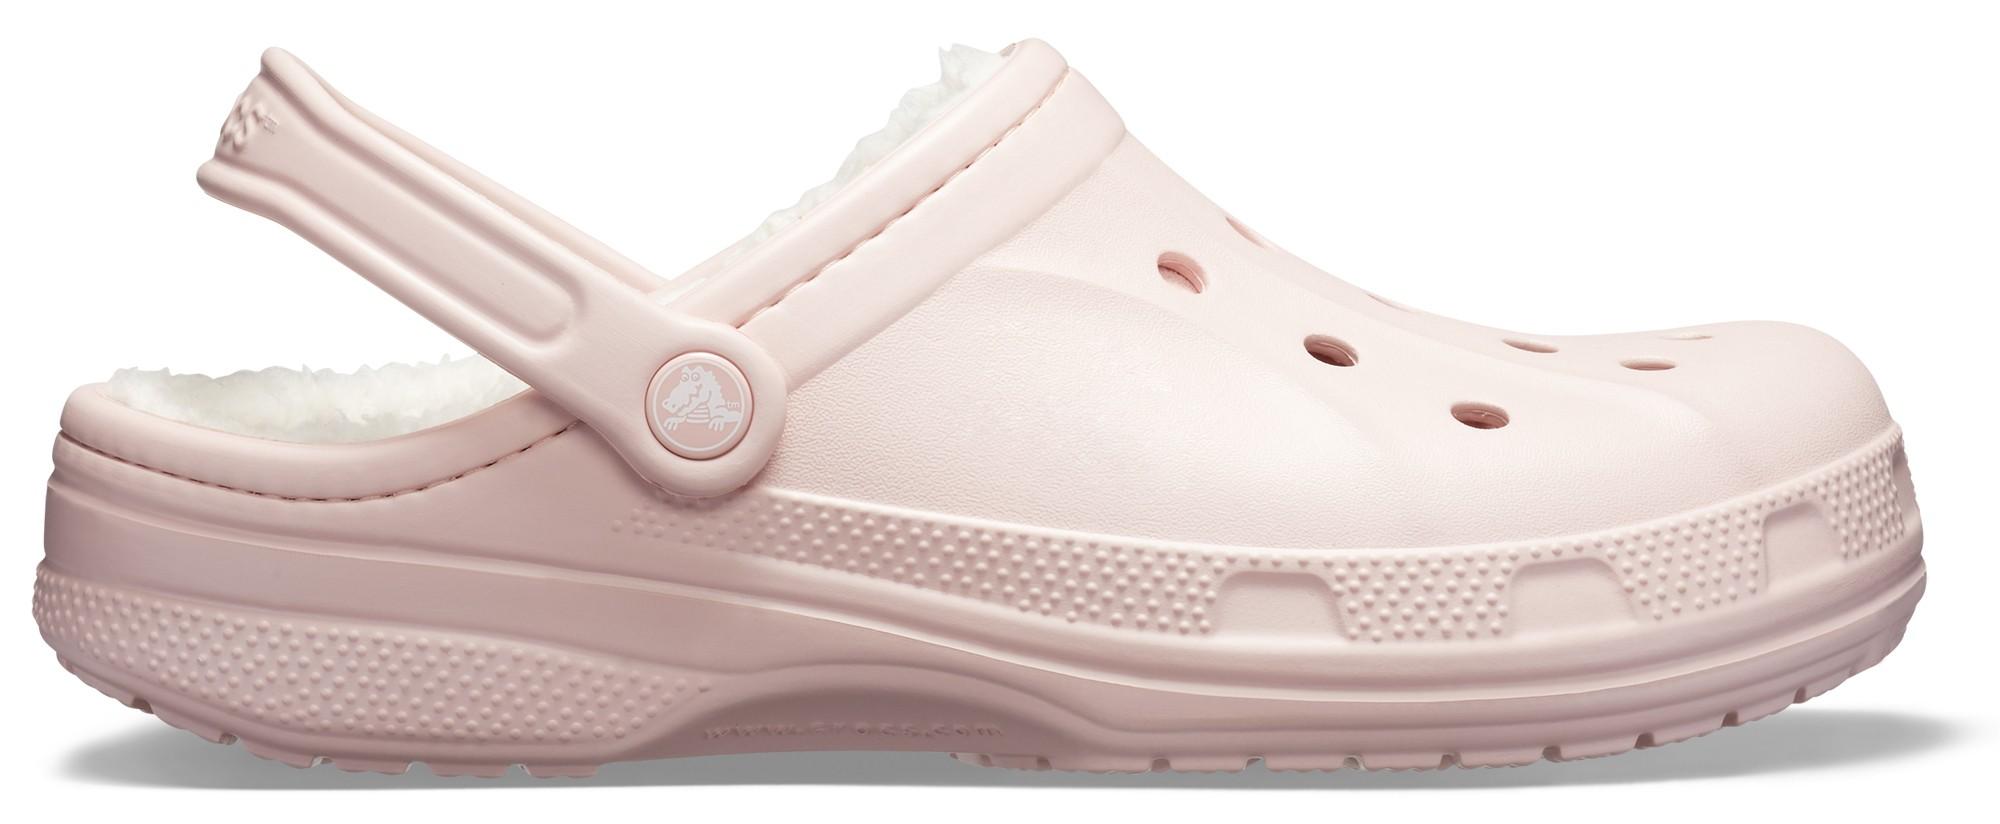 Crocs™ Ralen Lined Clog Cotton Candy/Oatmeal 37,5